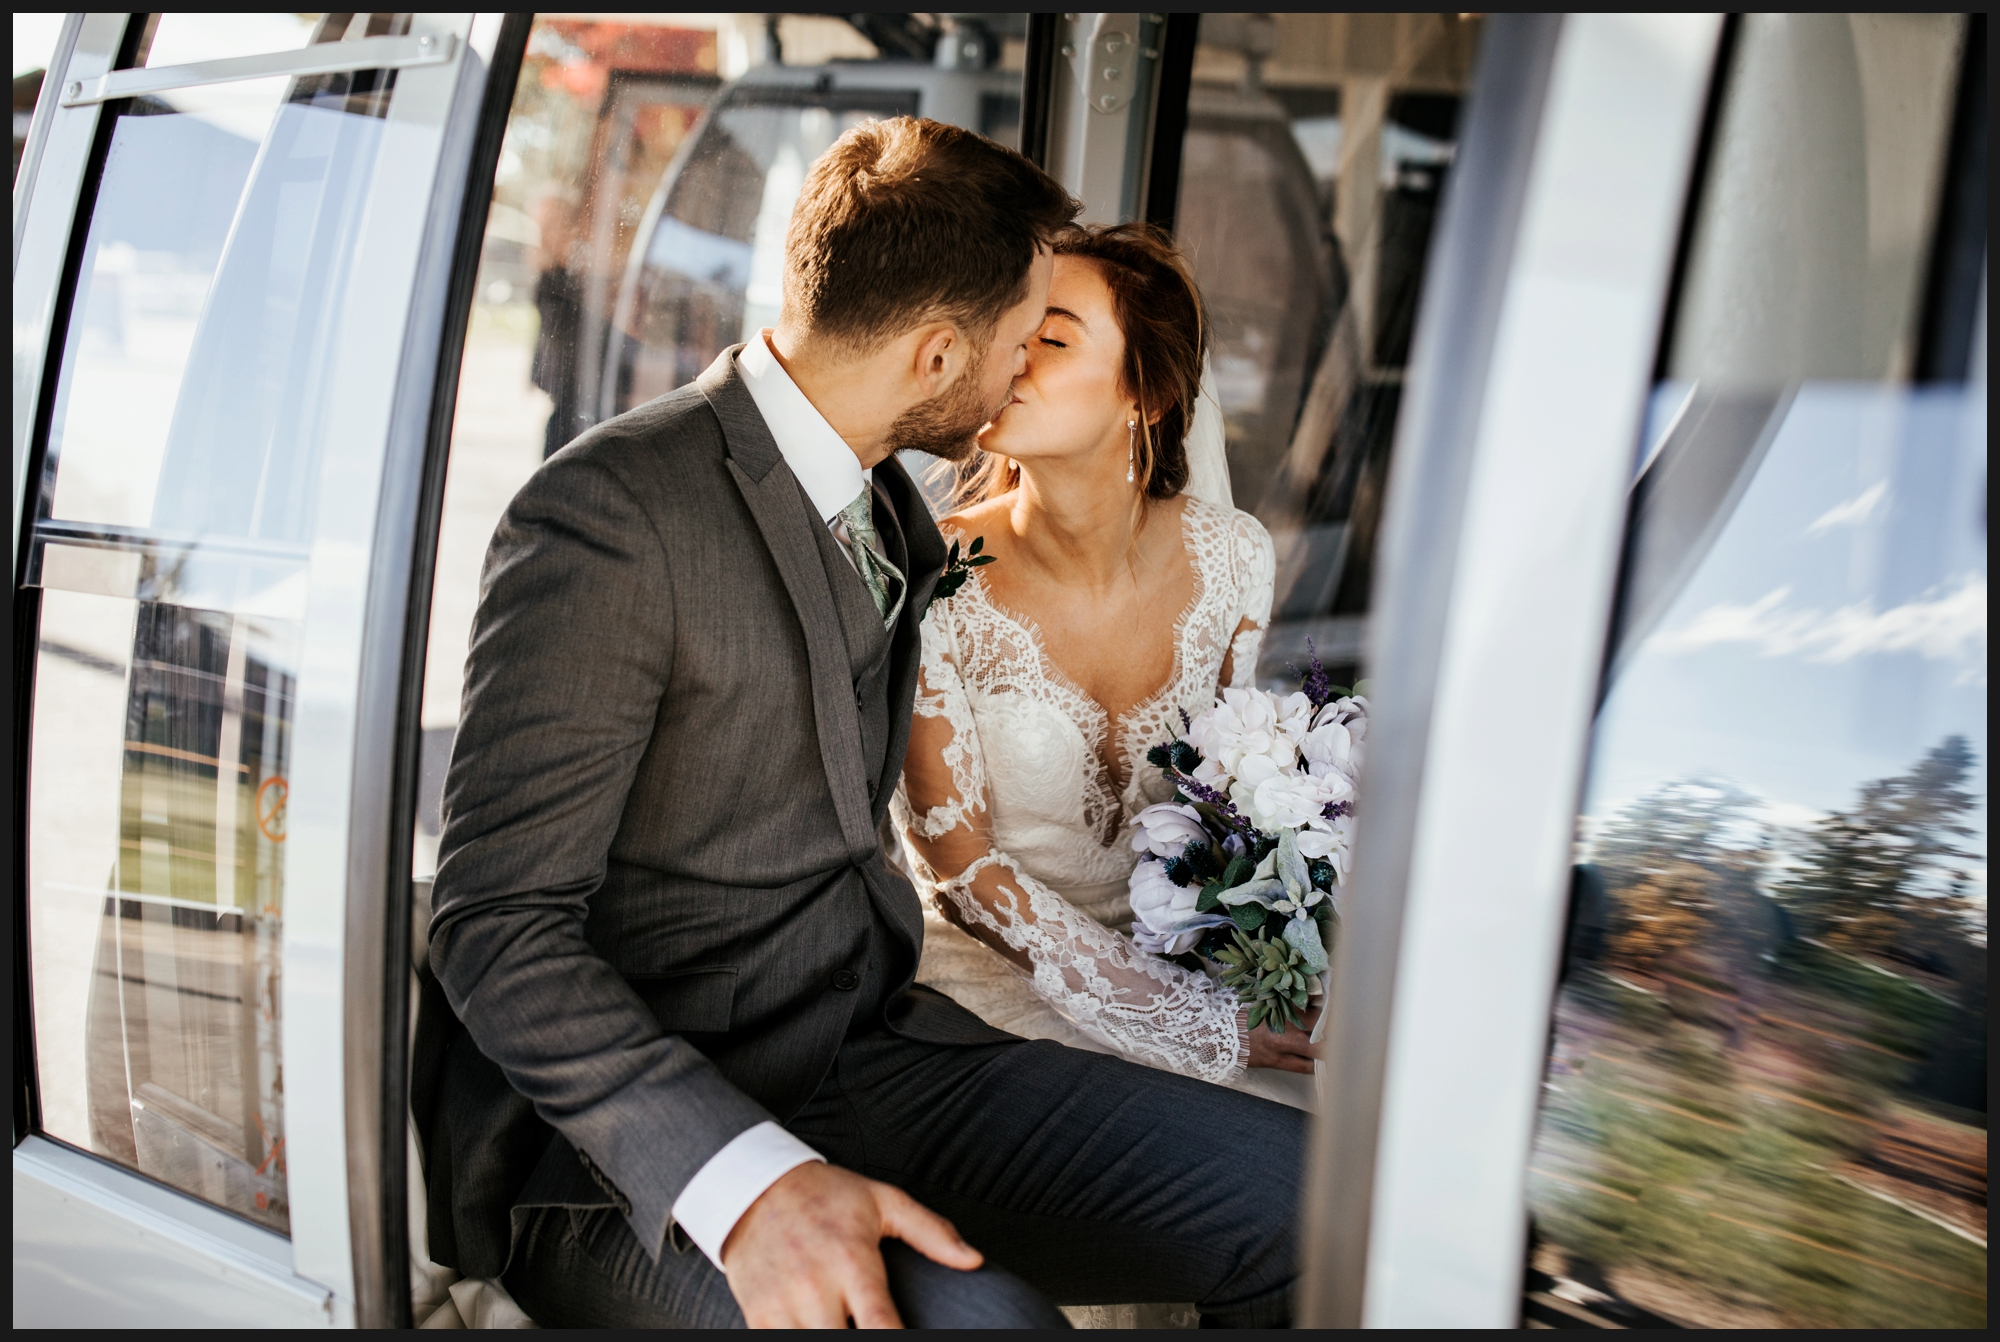 Orlando-Wedding-Photographer-destination-wedding-photographer-florida-wedding-photographer-hawaii-wedding-photographer_0158.jpg